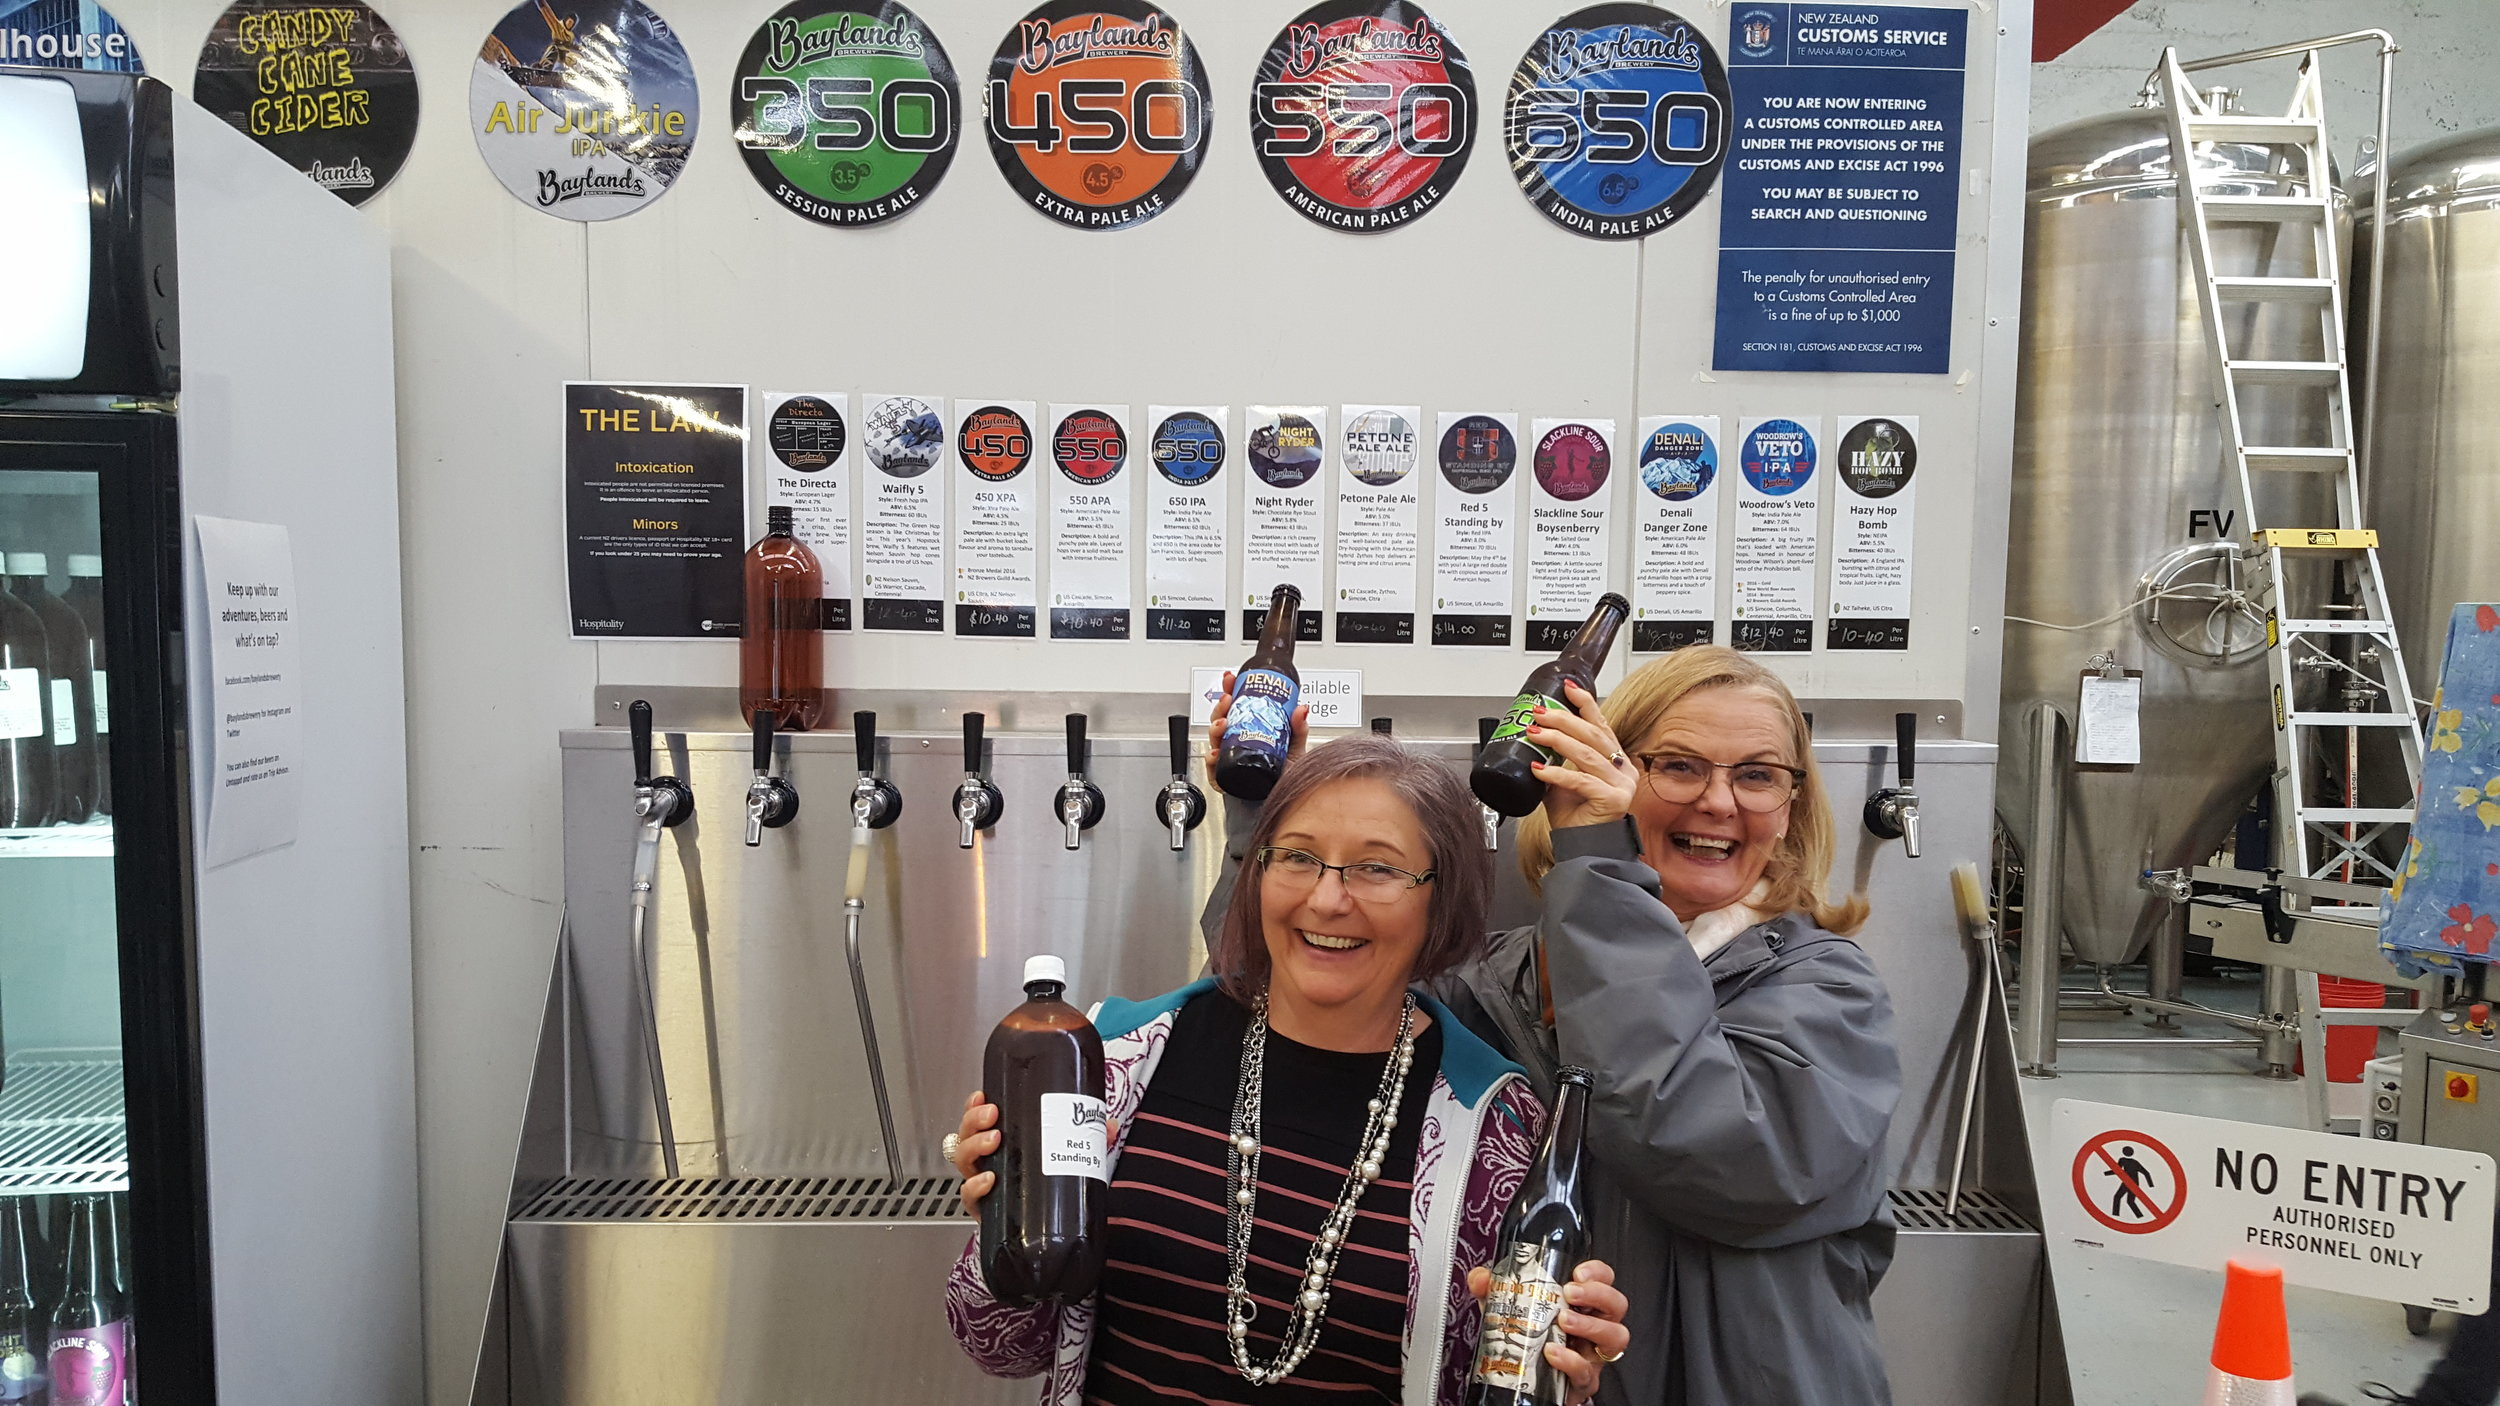 Craft Brewery Tour pic 2.jpg